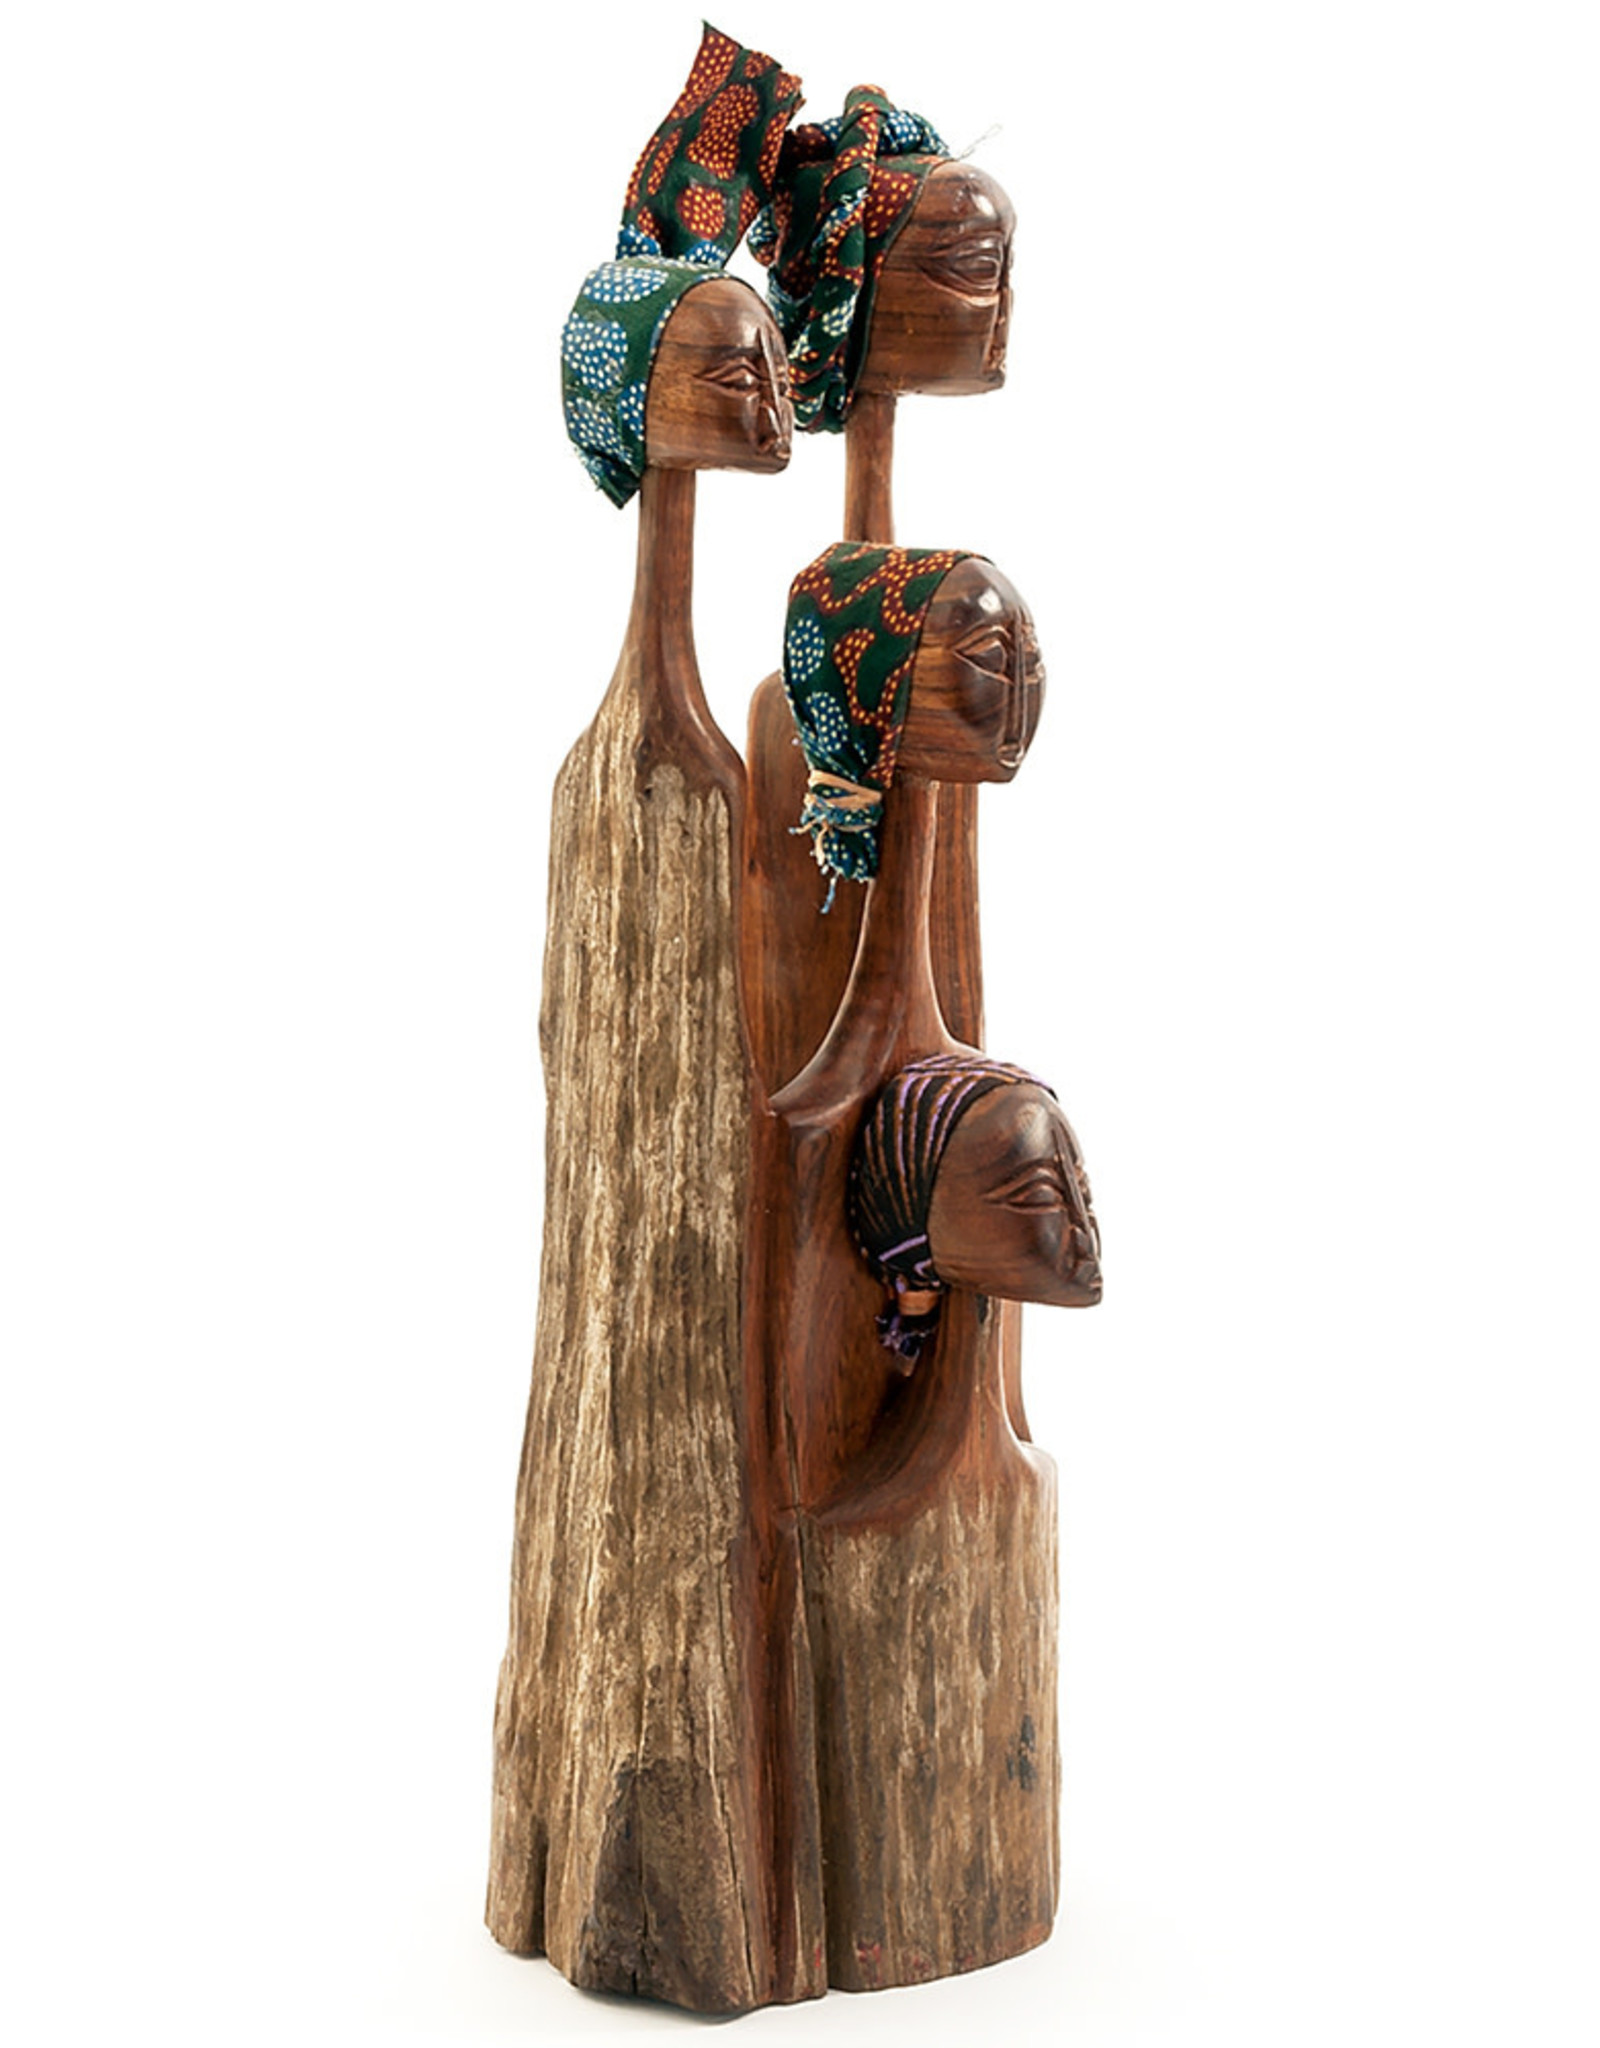 Swahili Wholesale Four Sisters Sandalwood Sculpture, Mozambique